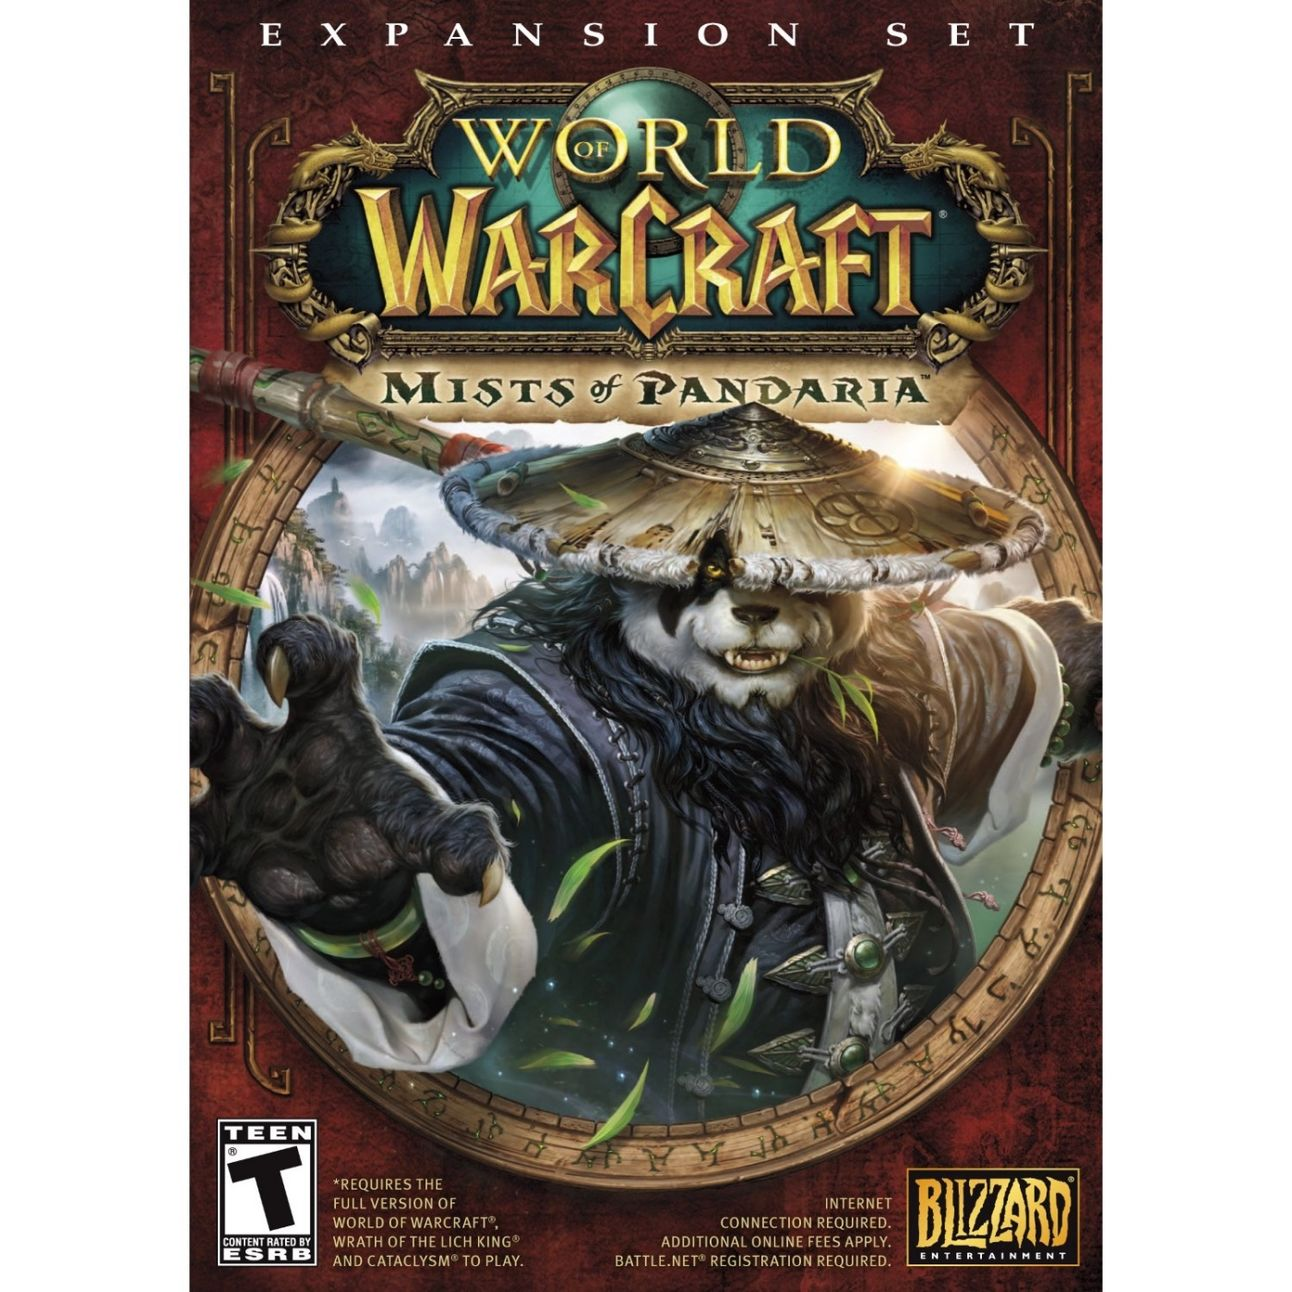 World-of-Warcraft-Mists-of-Pandaria-Box-Art.jpg